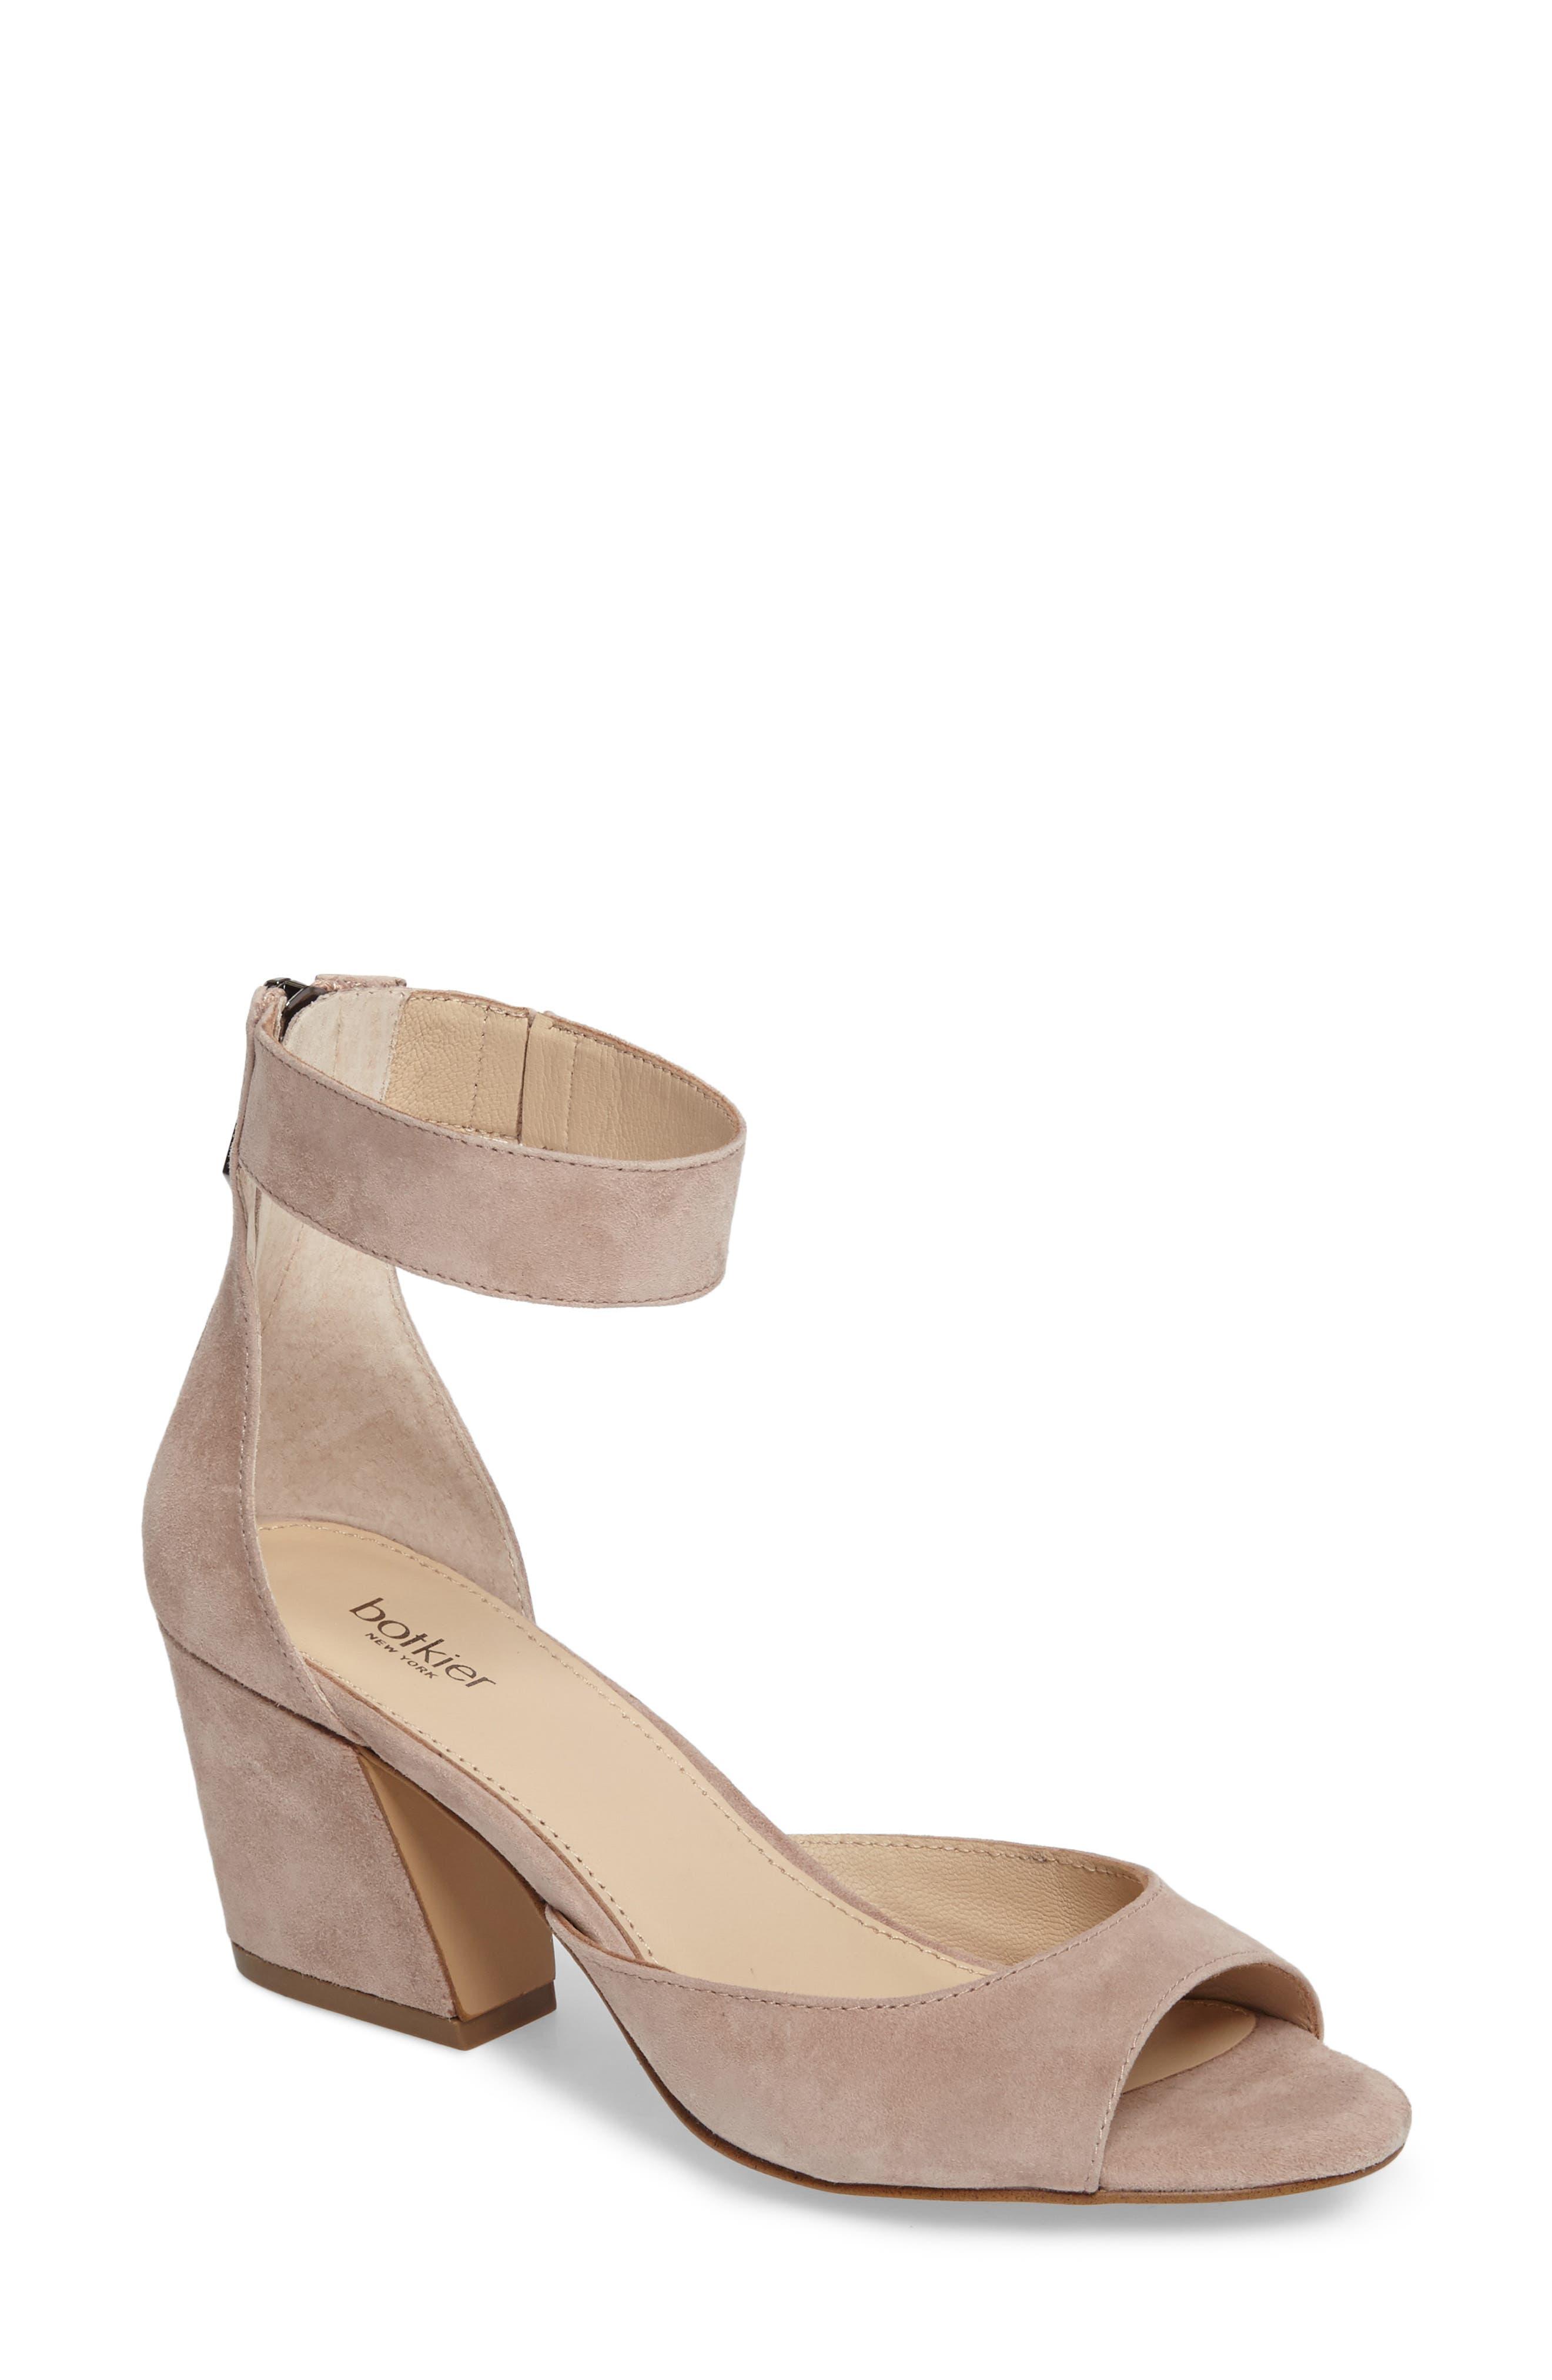 Main Image - Botkier Pilar Ankle Strap Sandal (Women)